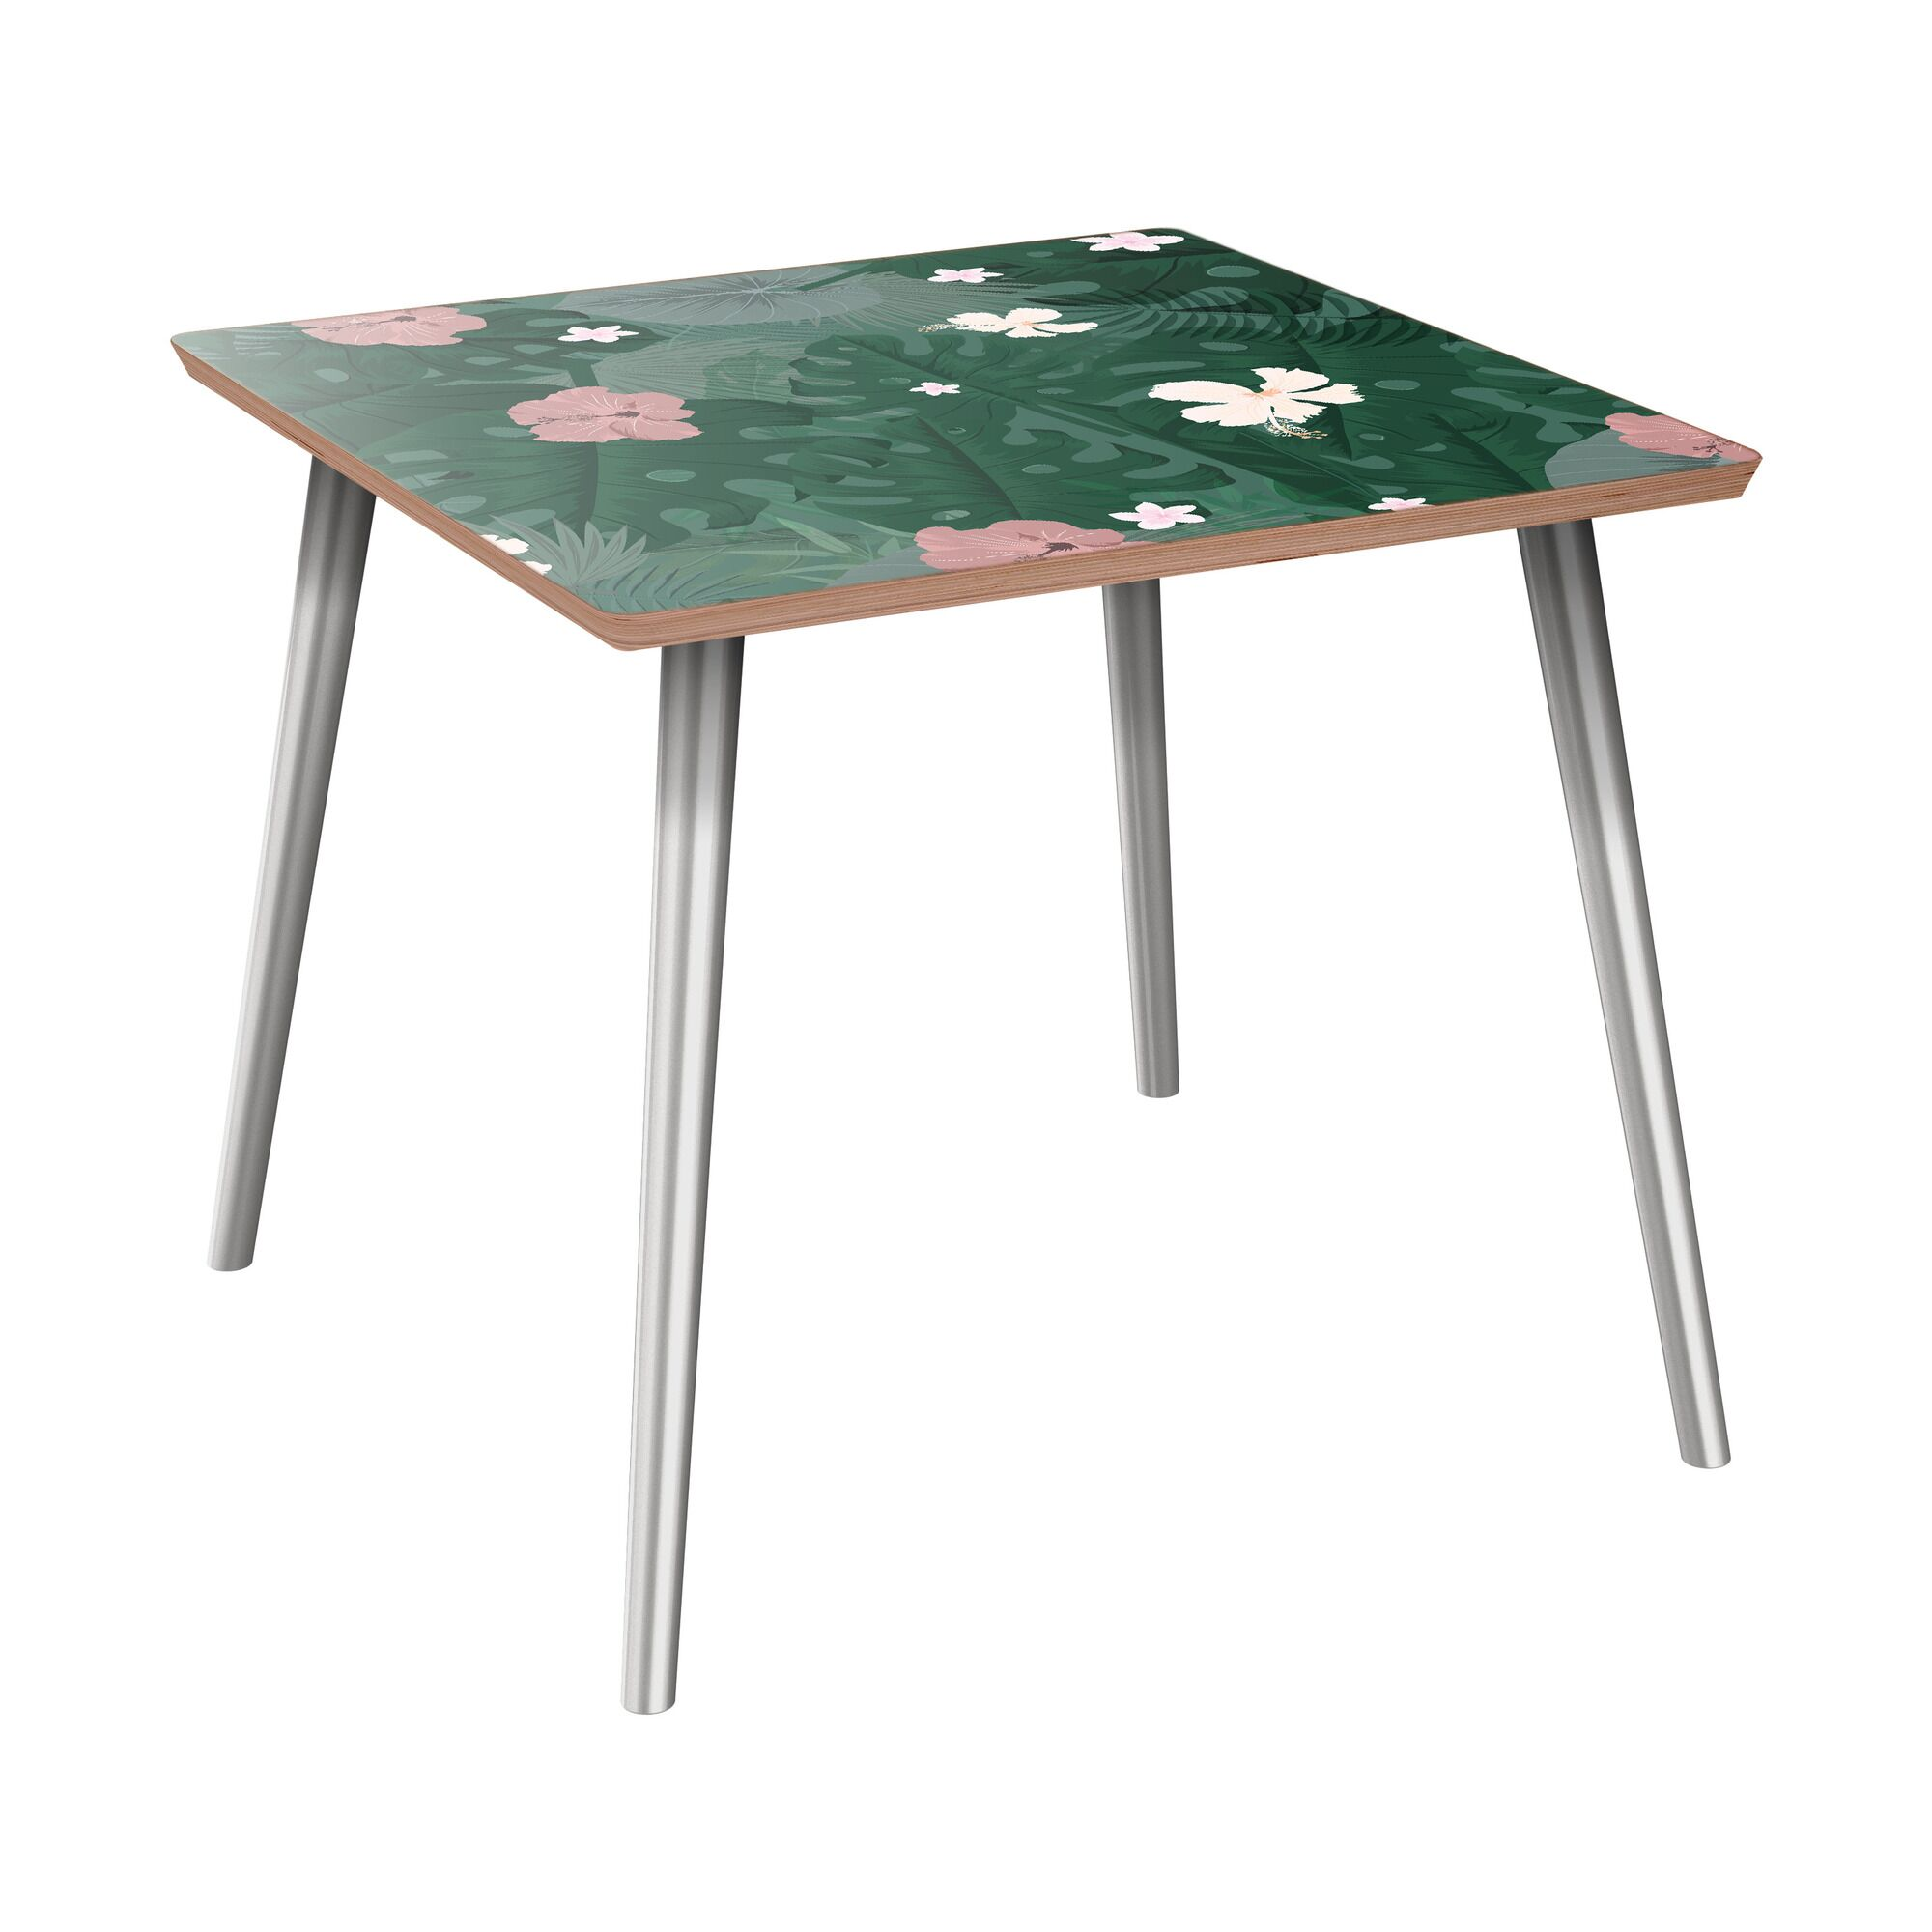 Keystone End Table Table Top Color: Walnut, Table Base Color: Chrome